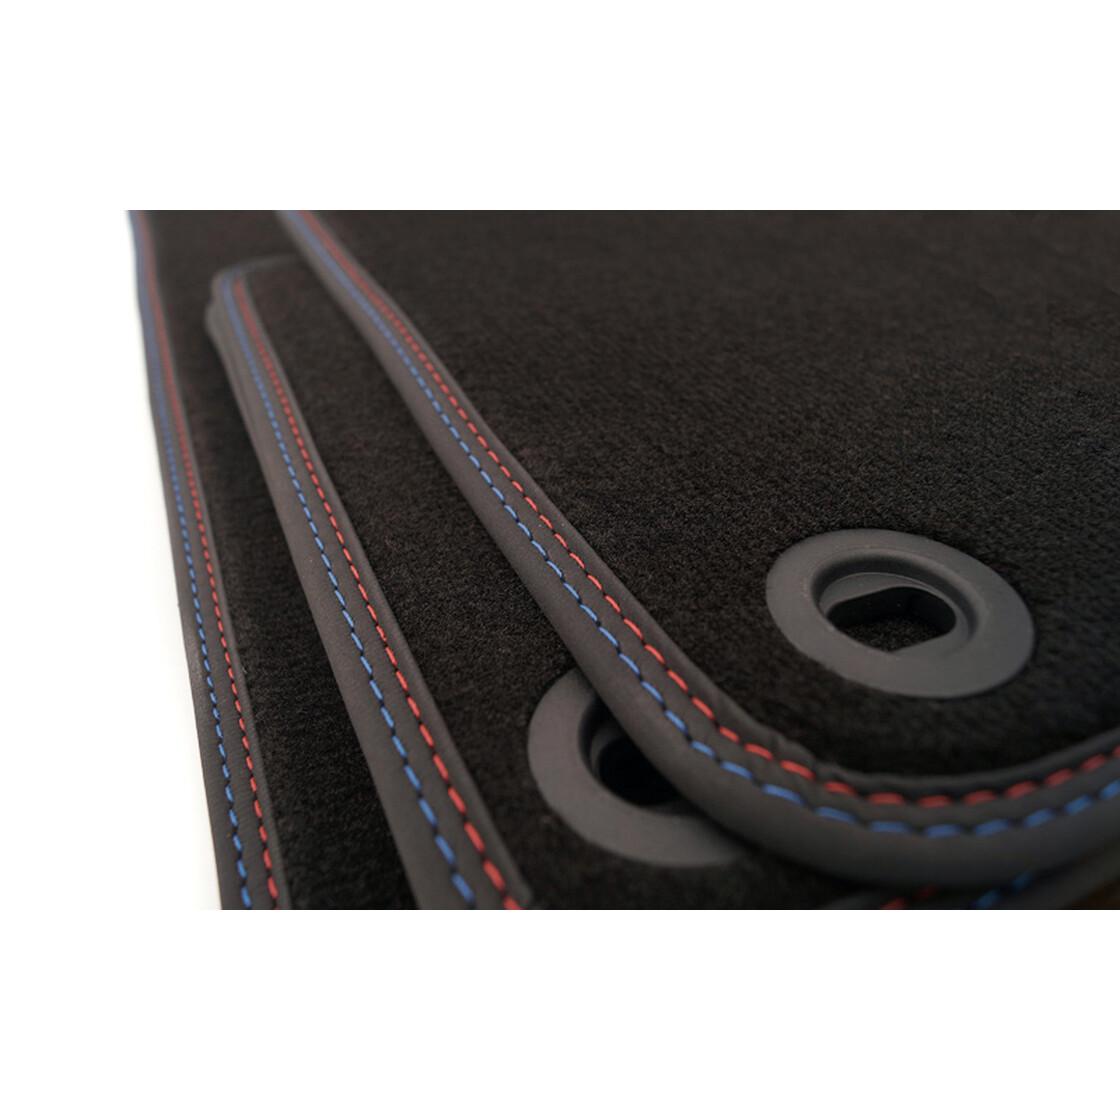 bmw 3er cabrio e36 fu matten im m3 design kaufen. Black Bedroom Furniture Sets. Home Design Ideas